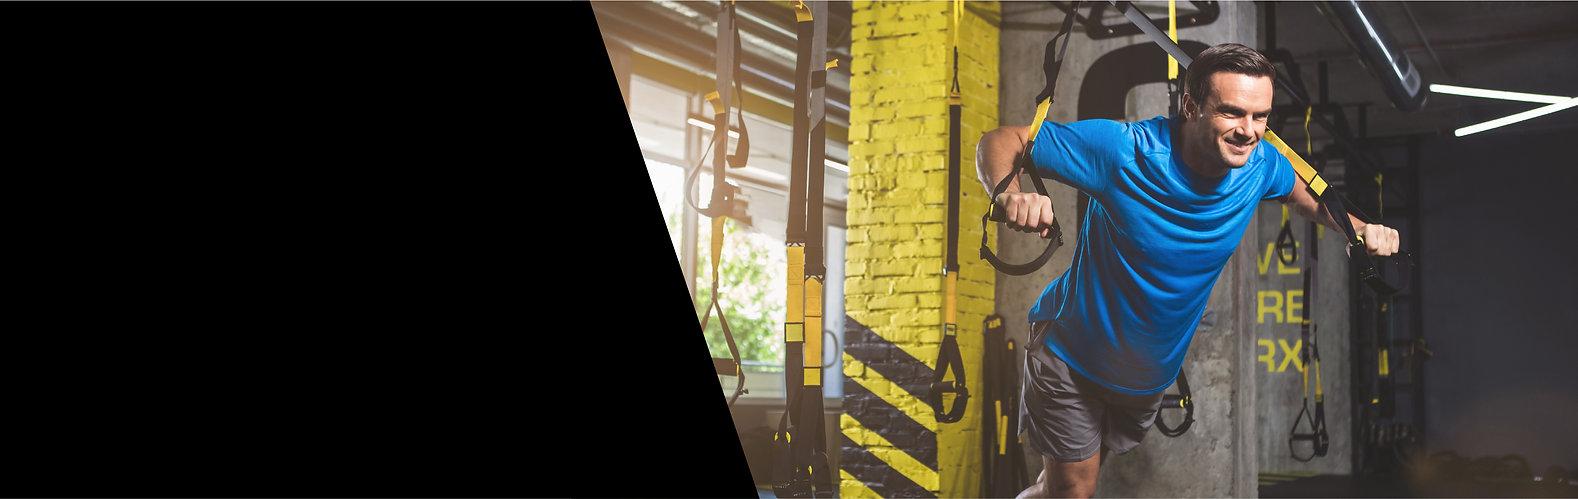 EnergyFitness_Website_Design_R1-15.jpg